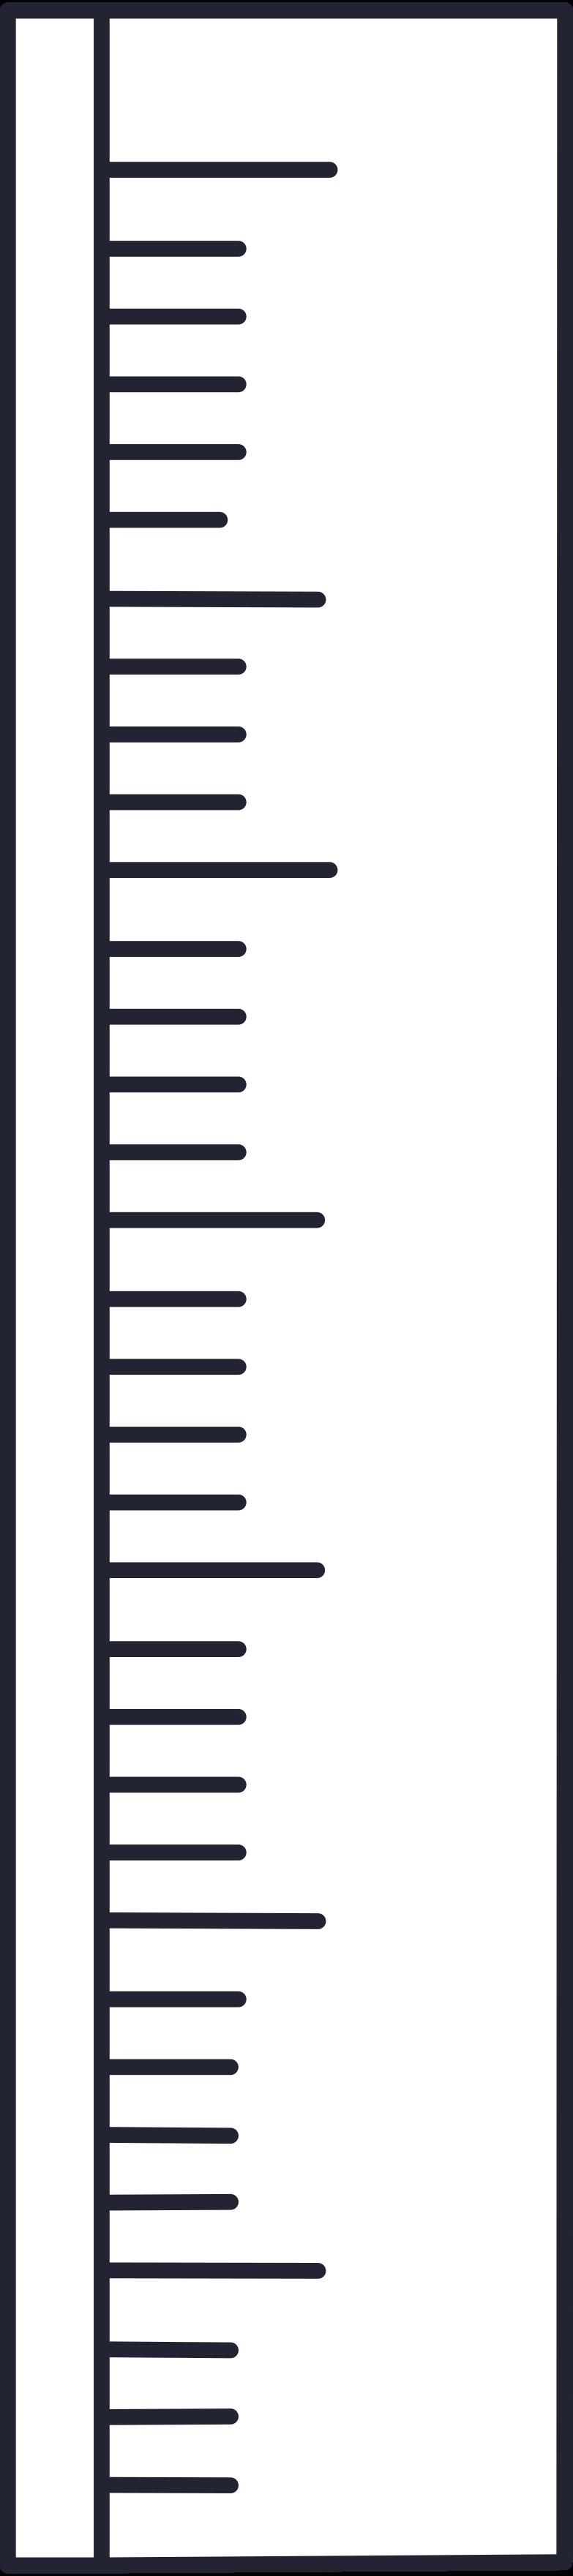 growing up  meter Clipart illustration in PNG, SVG